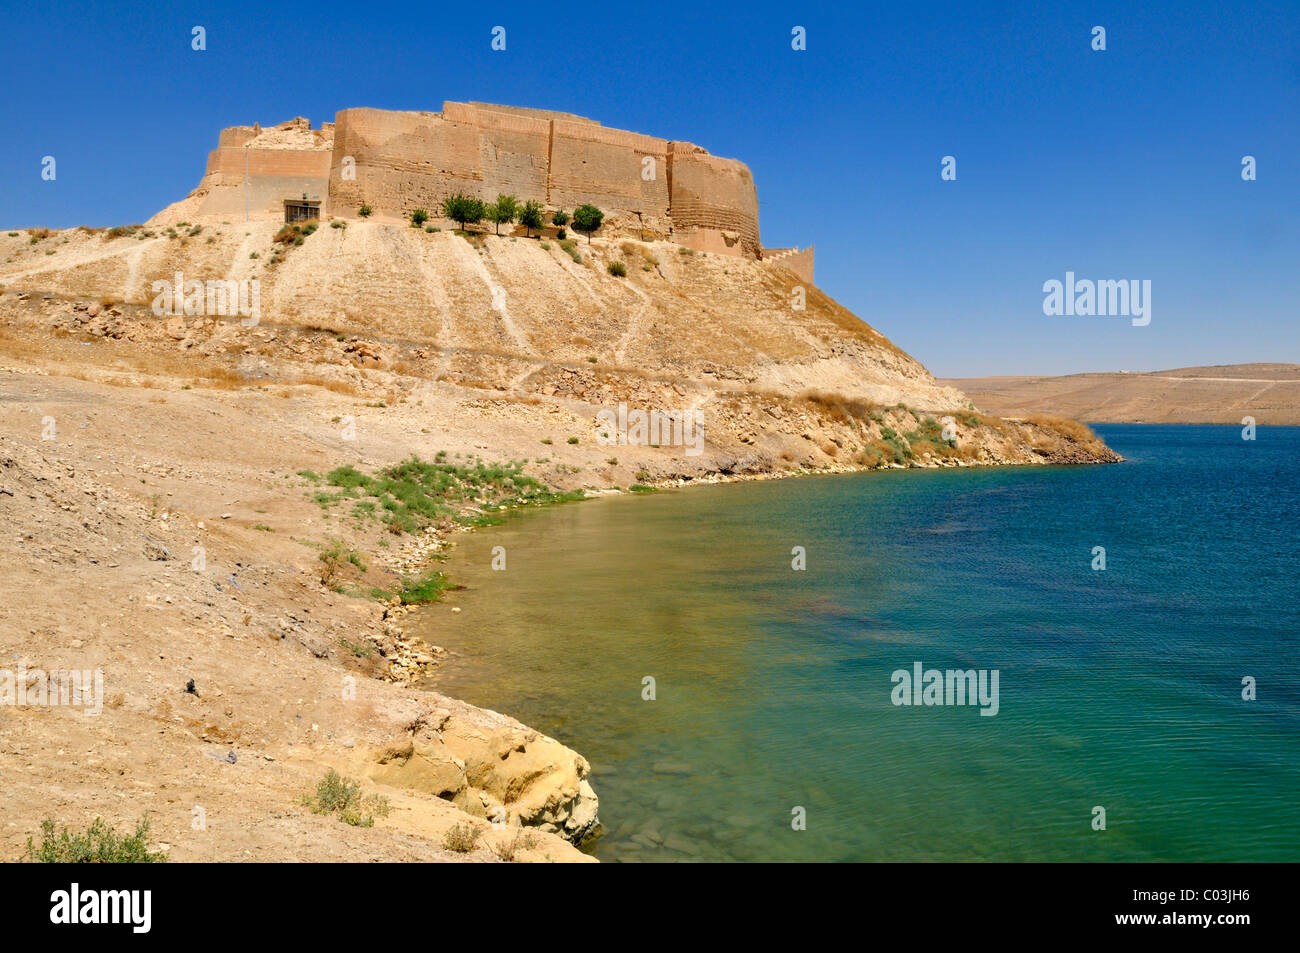 Historic castle of Qalaat Najim overlooking Assad Lake, Euphrates, Syria, Middle East, West Asia - Stock Image